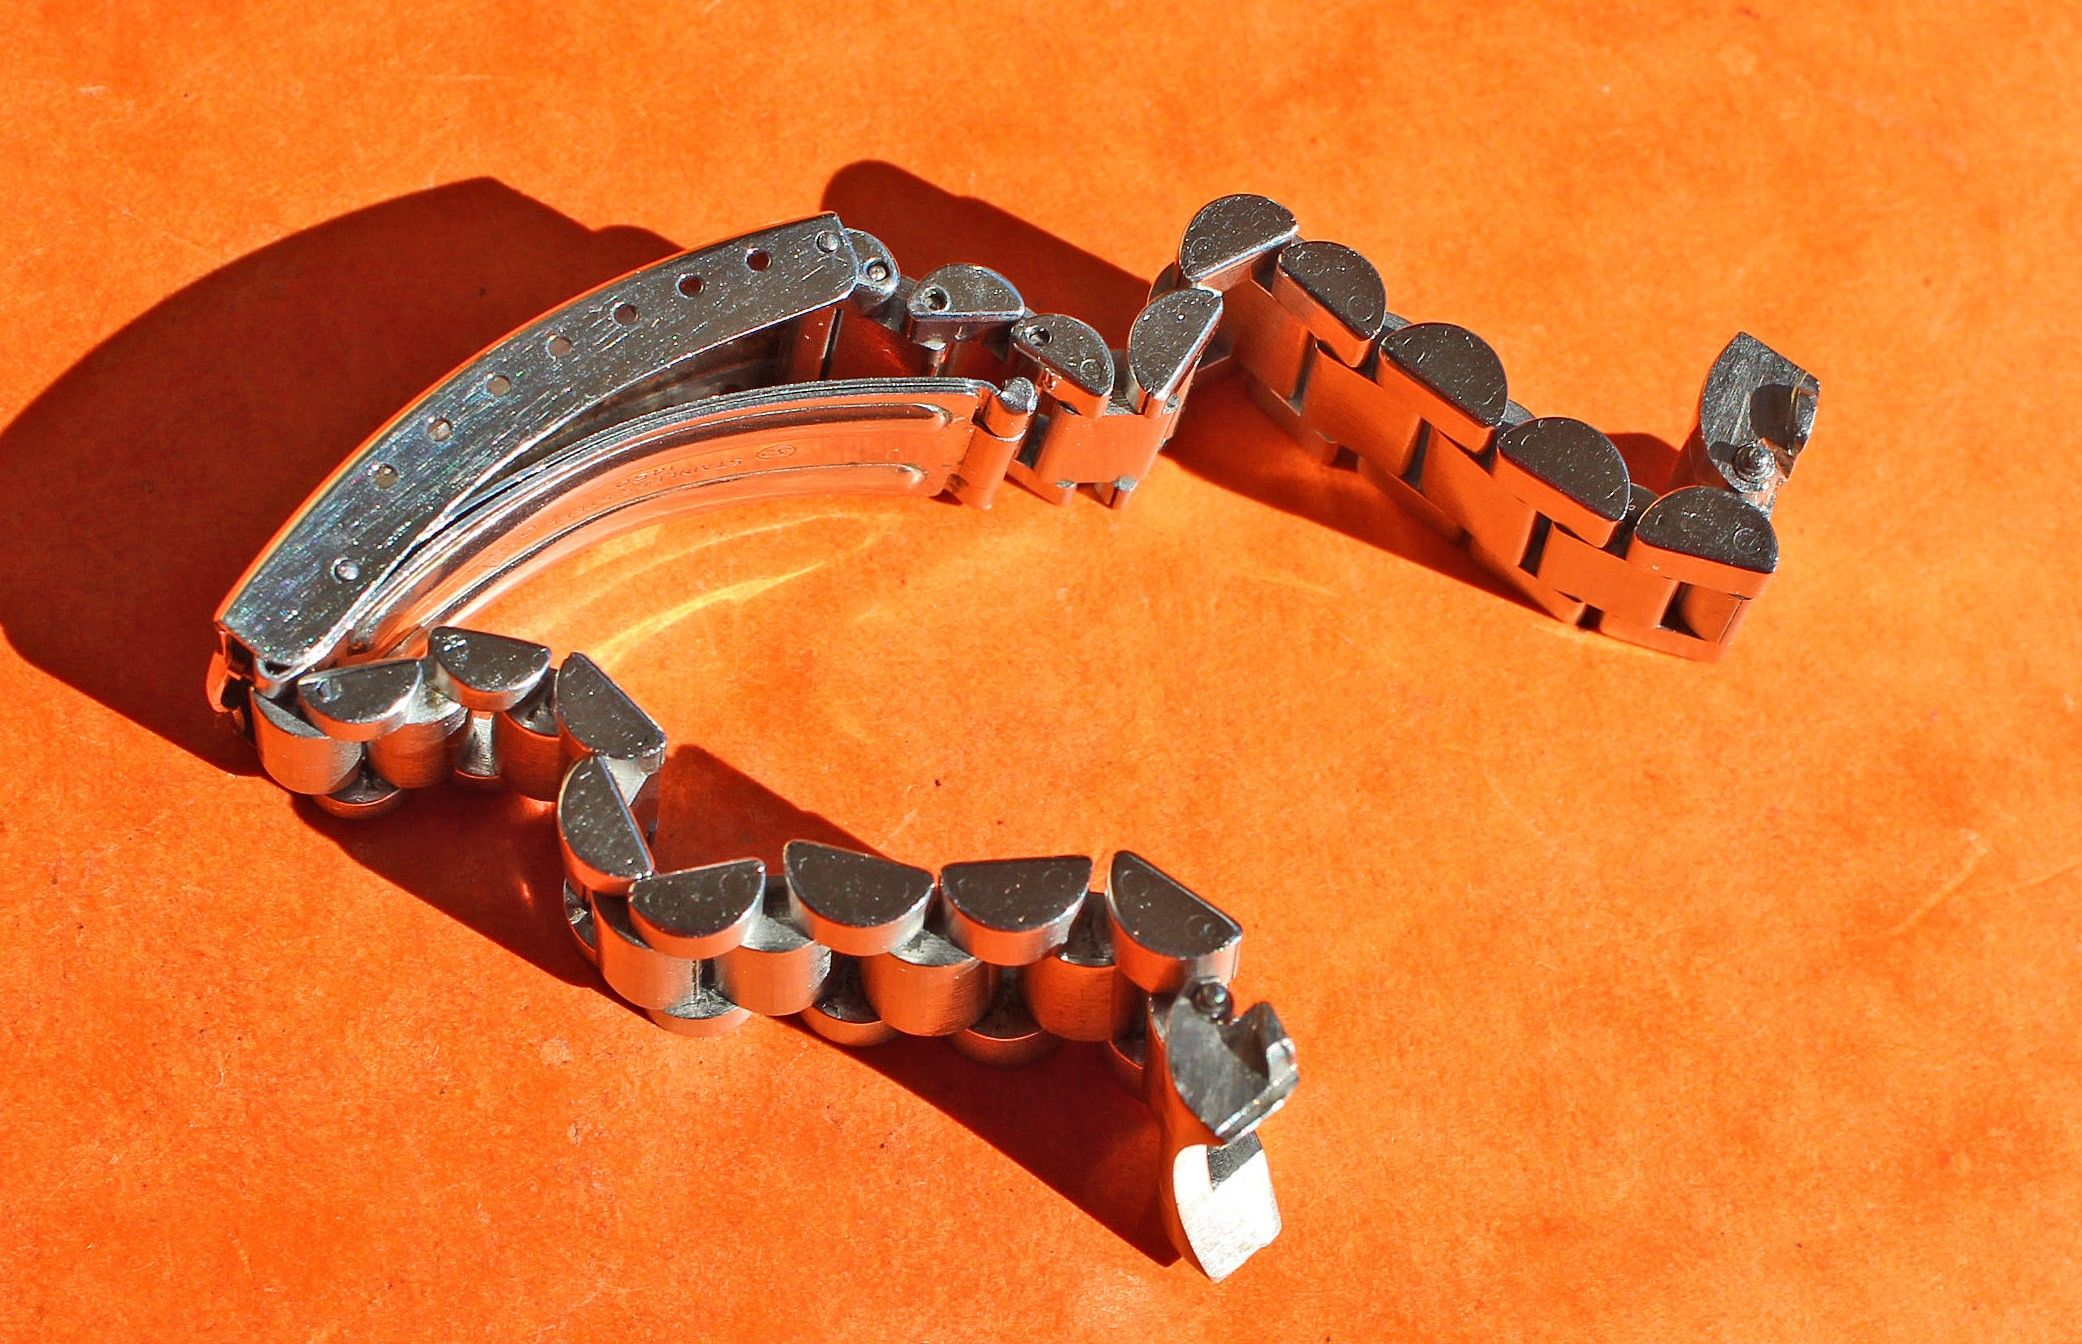 Omega Rare vintage Speedmaster Moonwatch bracelet ssteel 20mm ref. 1450 / 808 - Super Rare ! - CHRONO-SHOP